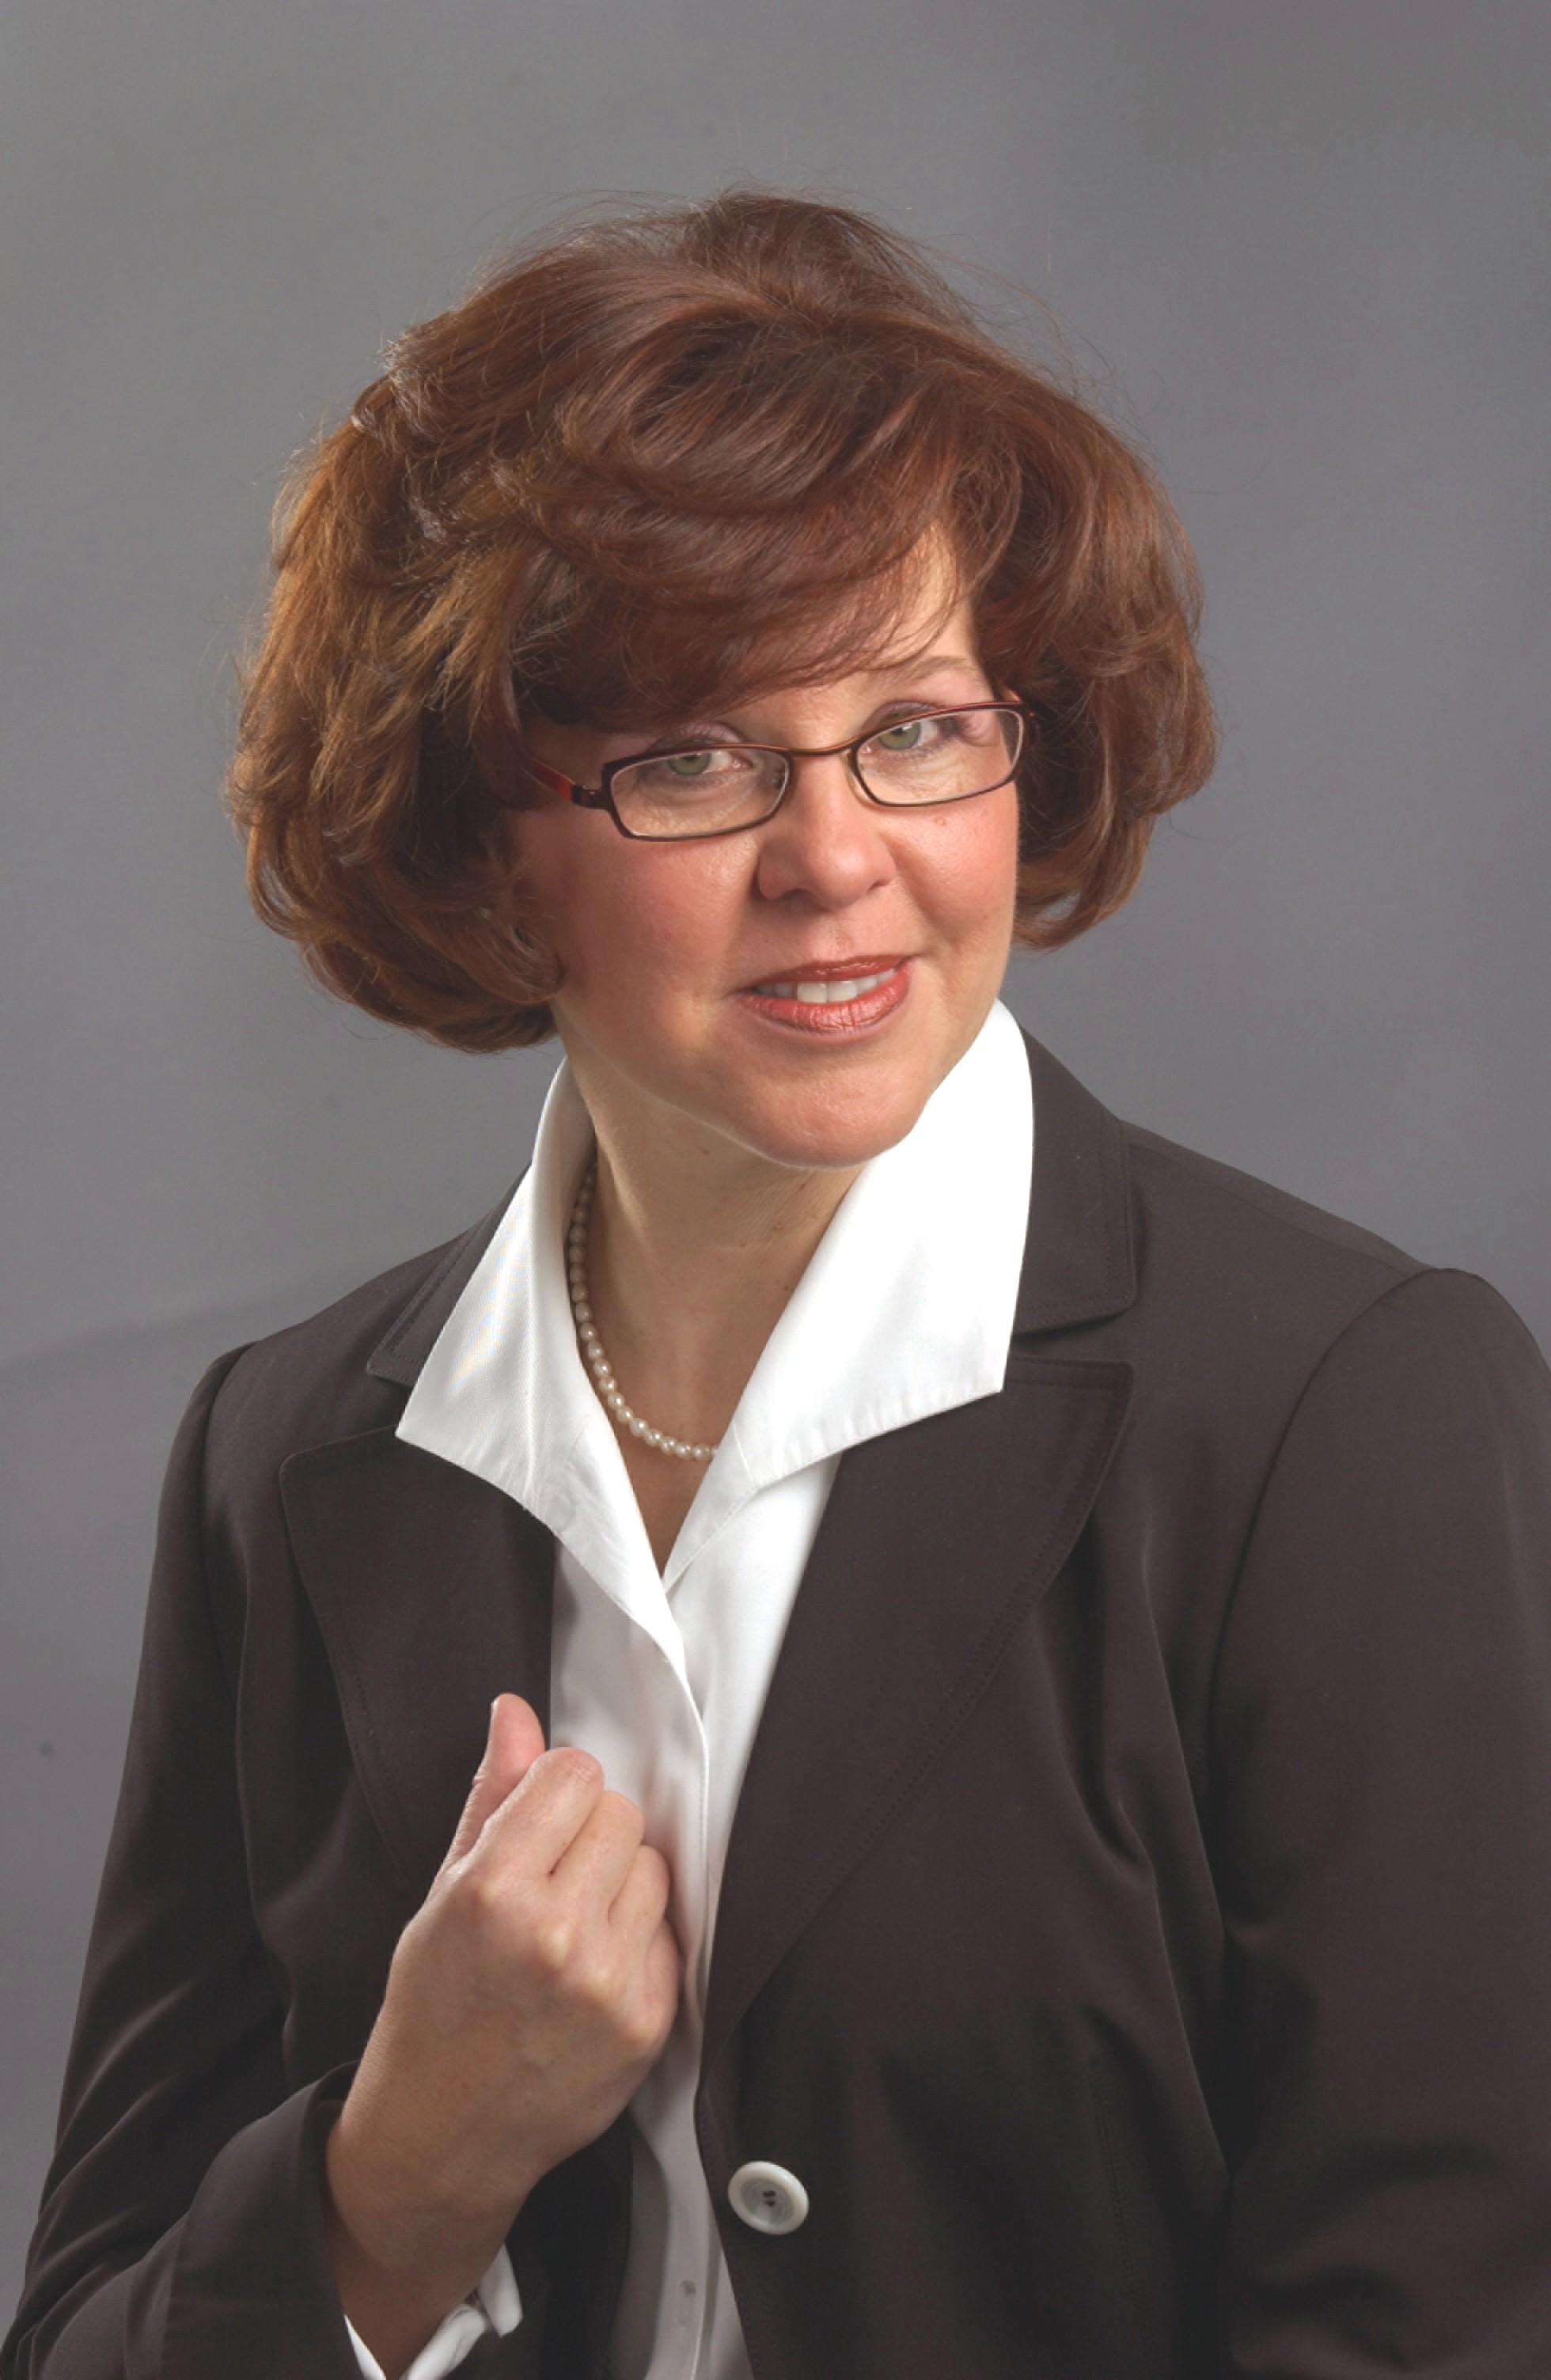 Regina Buschmann, cytoimmun diagnostics GmbH